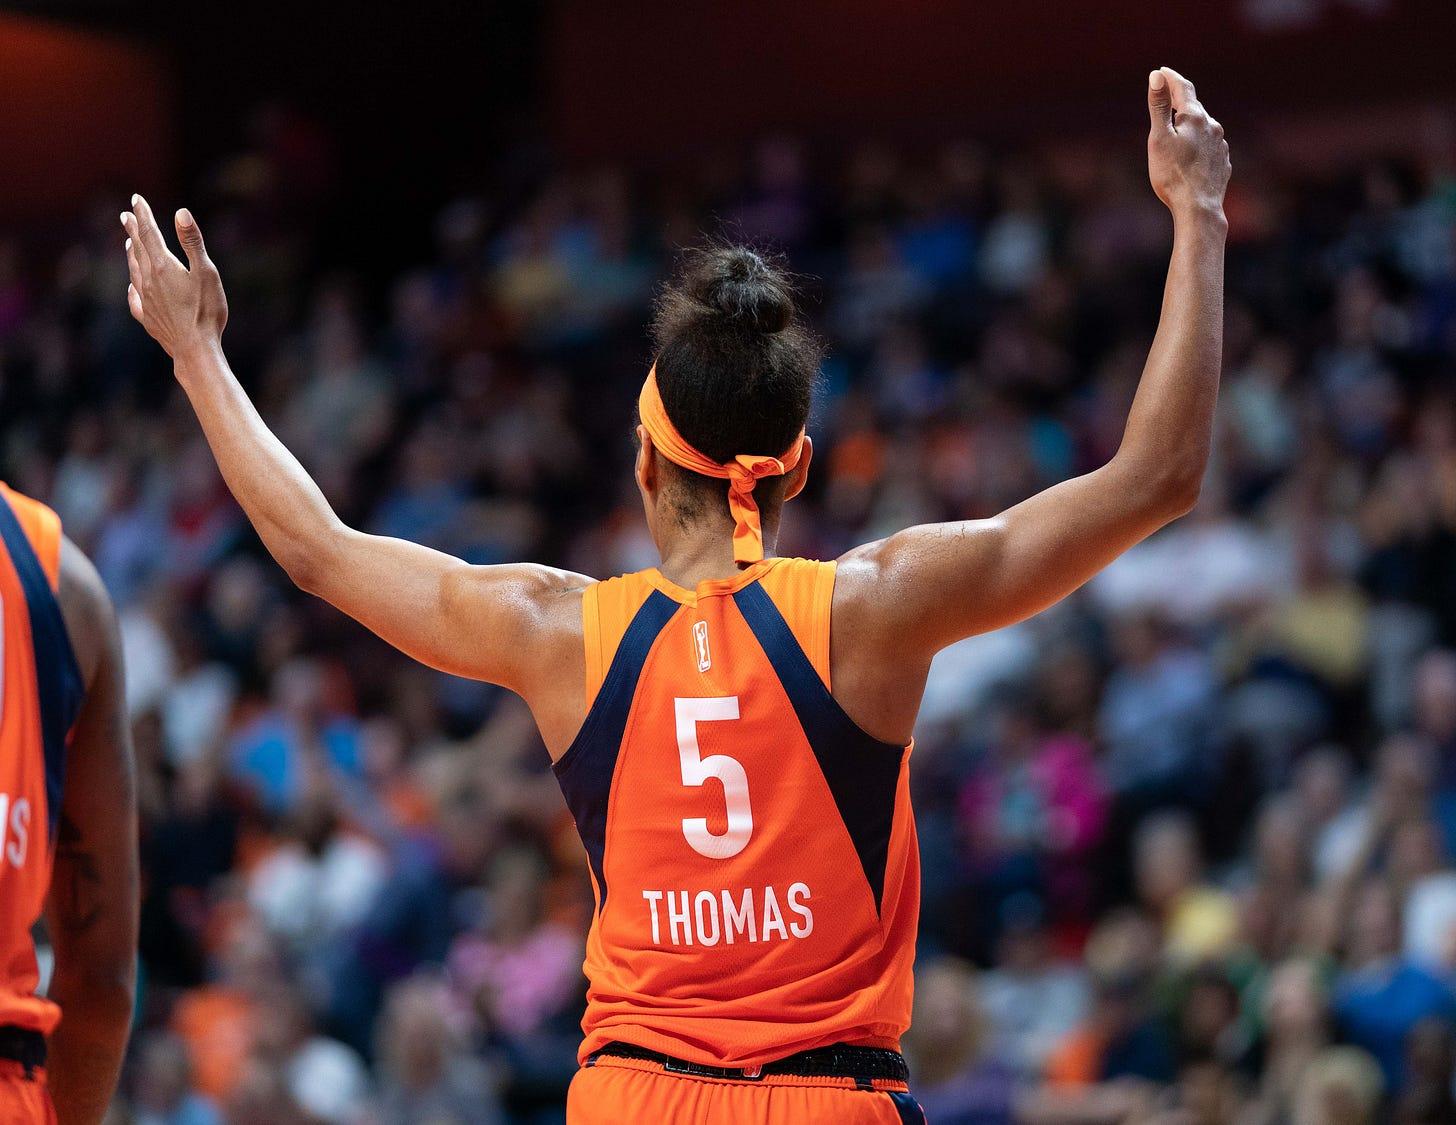 Connecticut Sun guard Jasmine Thomas (5) during the WNBA game between the Washington Mystics and the Connecticut Sun at Mohegan Sun Arena, Uncasville, Connecticut, USA on May 25, 2019. Photo Credit: Chris Poss